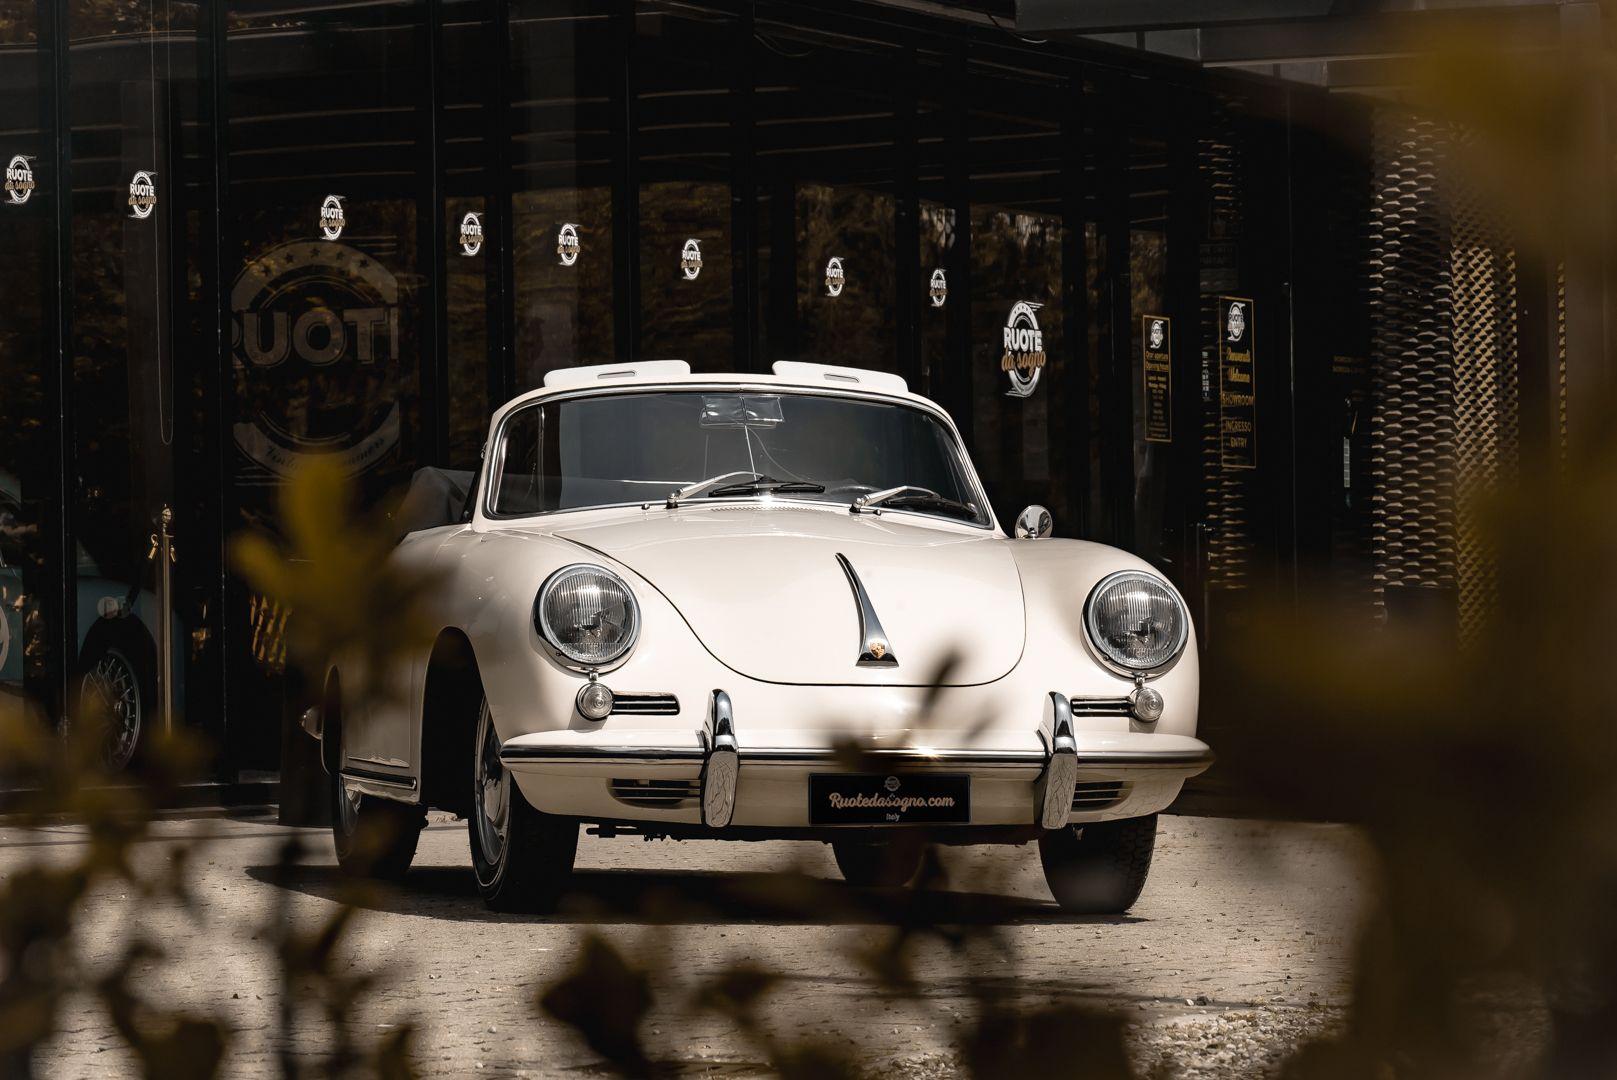 1964 PORSCHE 356 C Cabriolet 1600 SC 75431